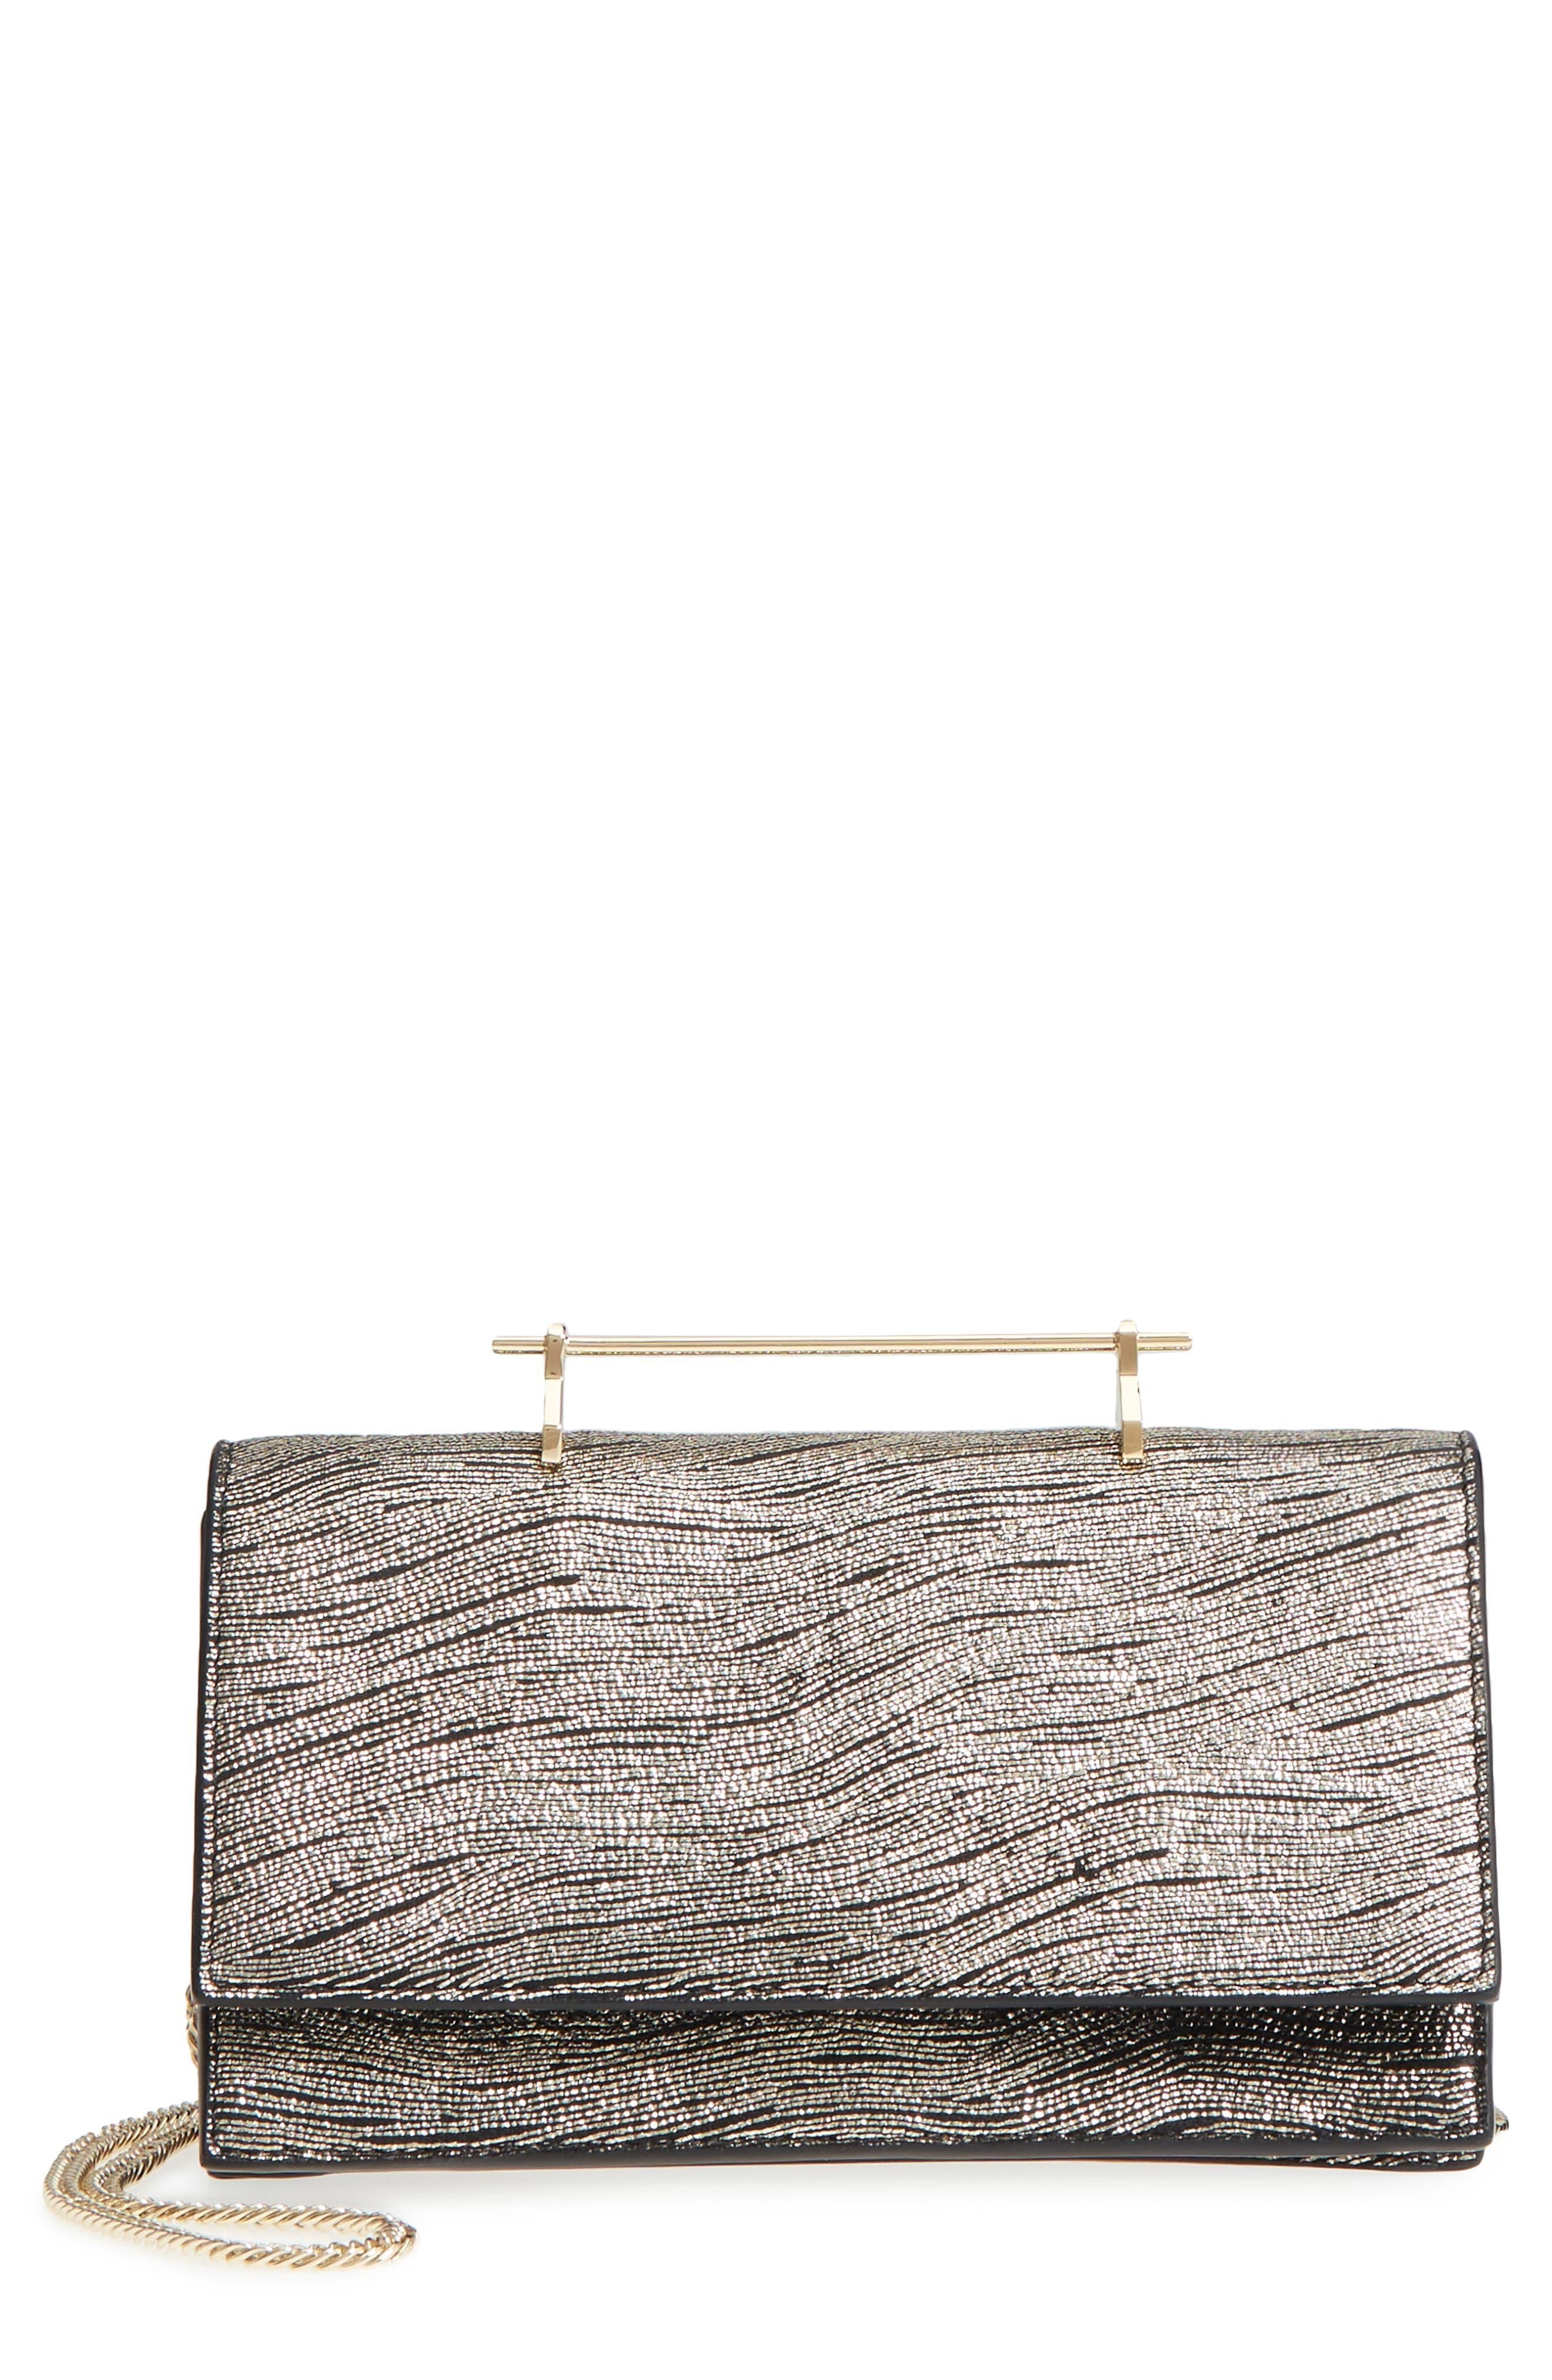 Alexia Metallic Calfskin Leather Clutch,                             Main thumbnail 1, color,                             710